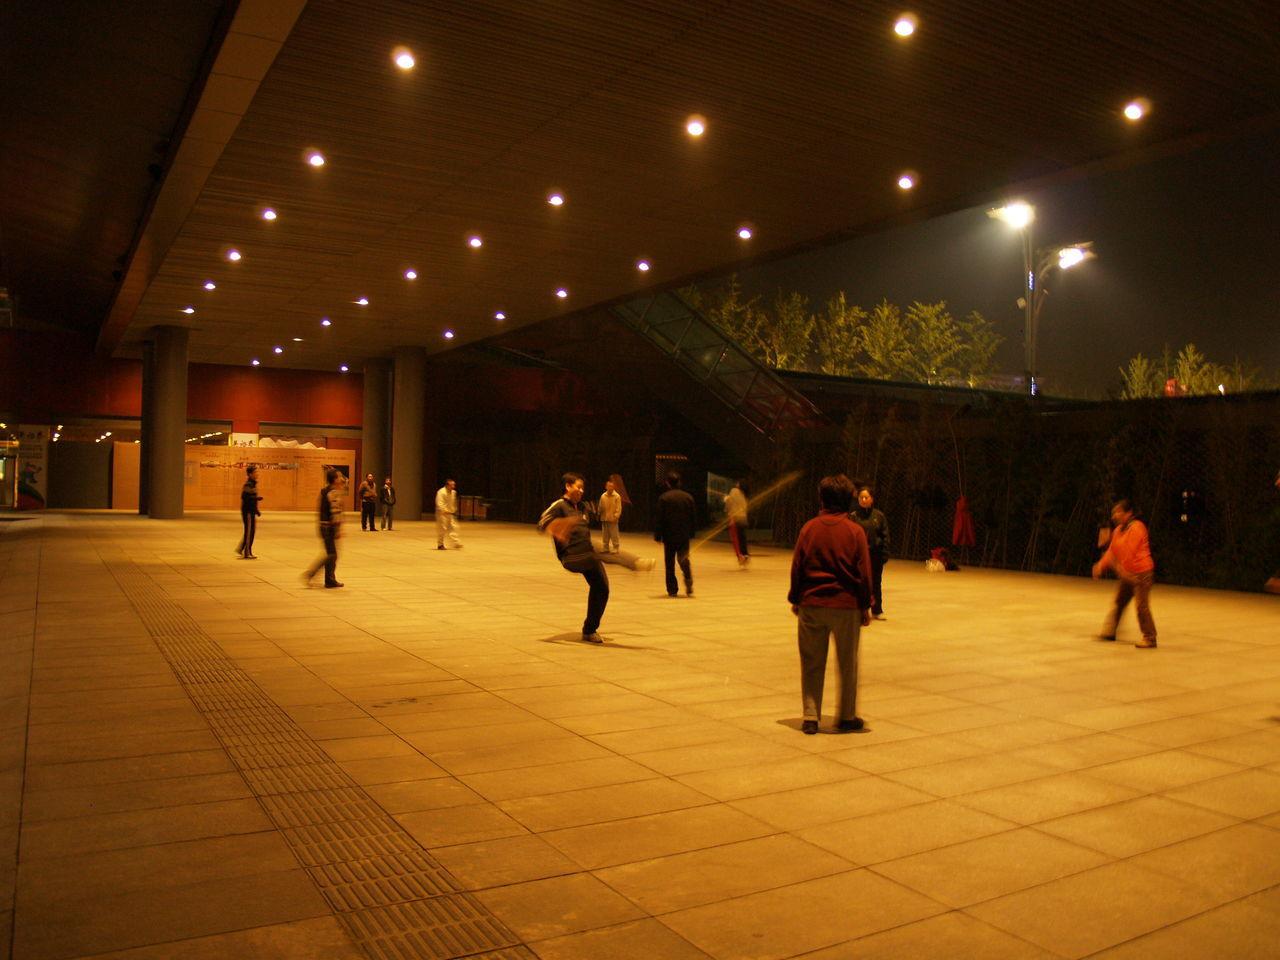 illuminated, men, indoors, leisure activity, large group of people, women, lifestyles, night, people